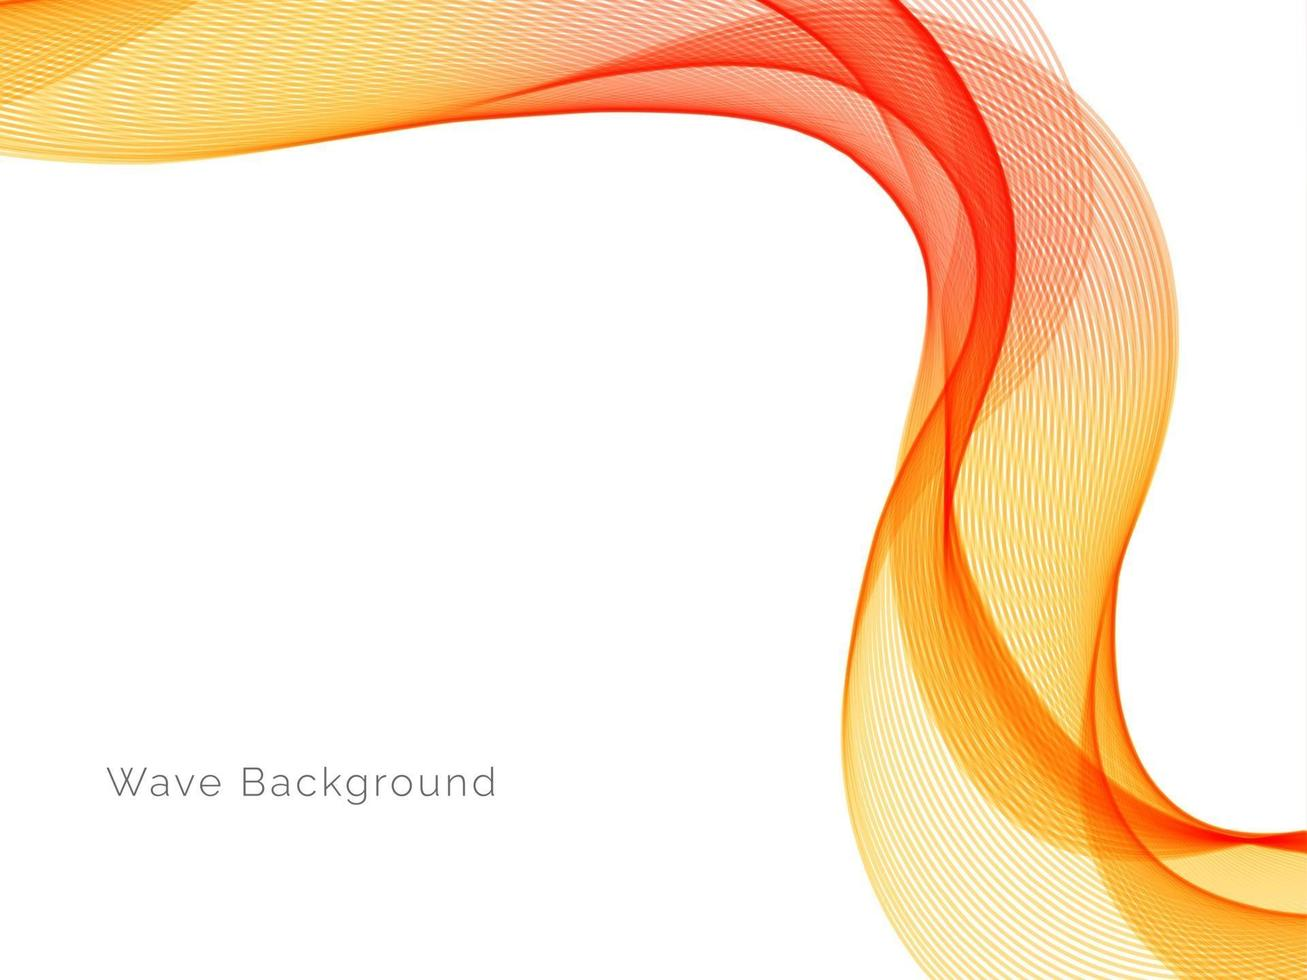 decoratief ontwerp modern patroon met stijlvolle gladde gele golf achtergrond vector